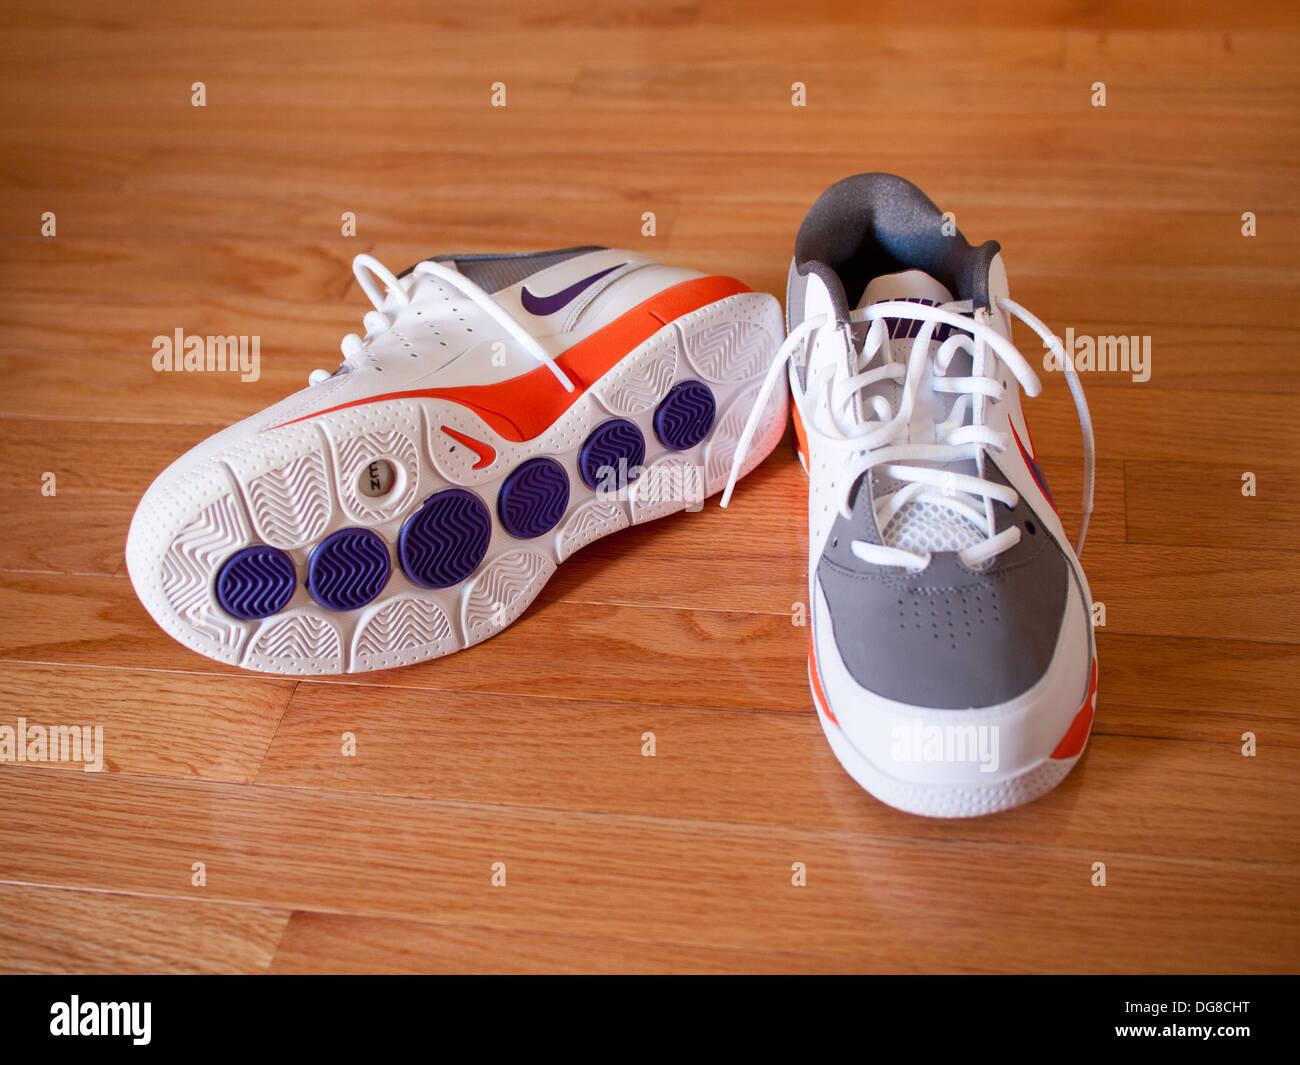 StockfotosNike Schuhe Bilder Alamy Schuhe Nike UzqMGSpV